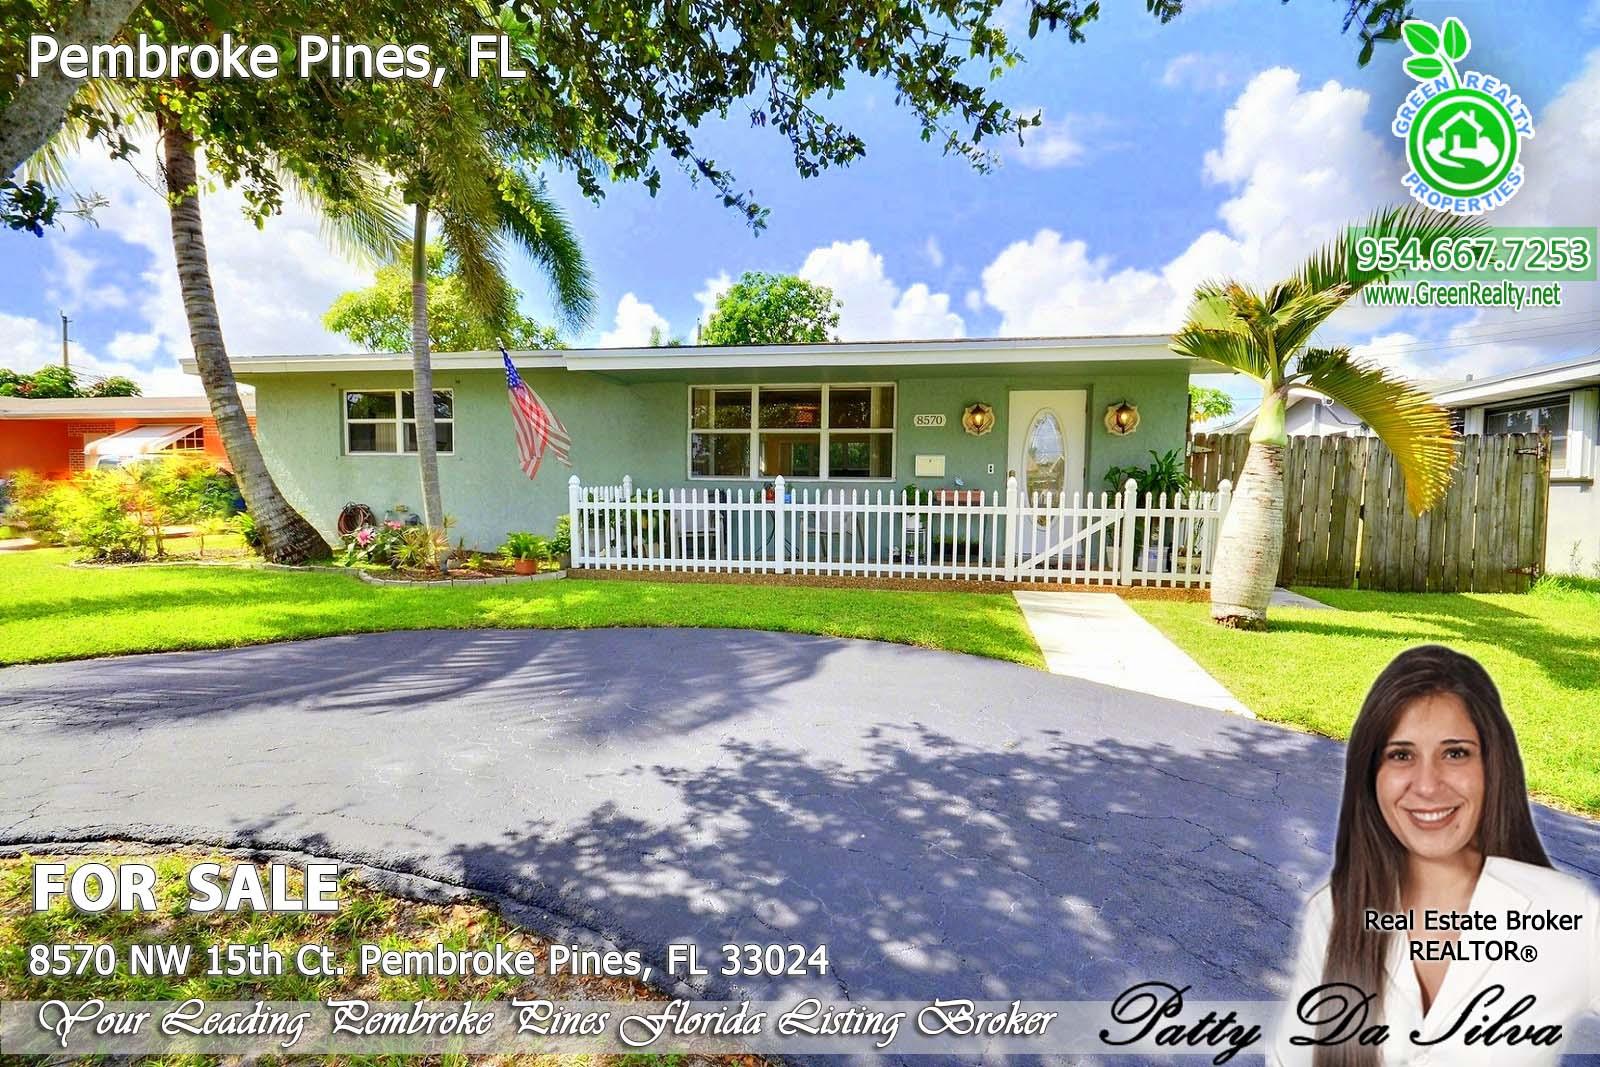 Pembroke Pines Homes For Sale - Best REALTORS (2)